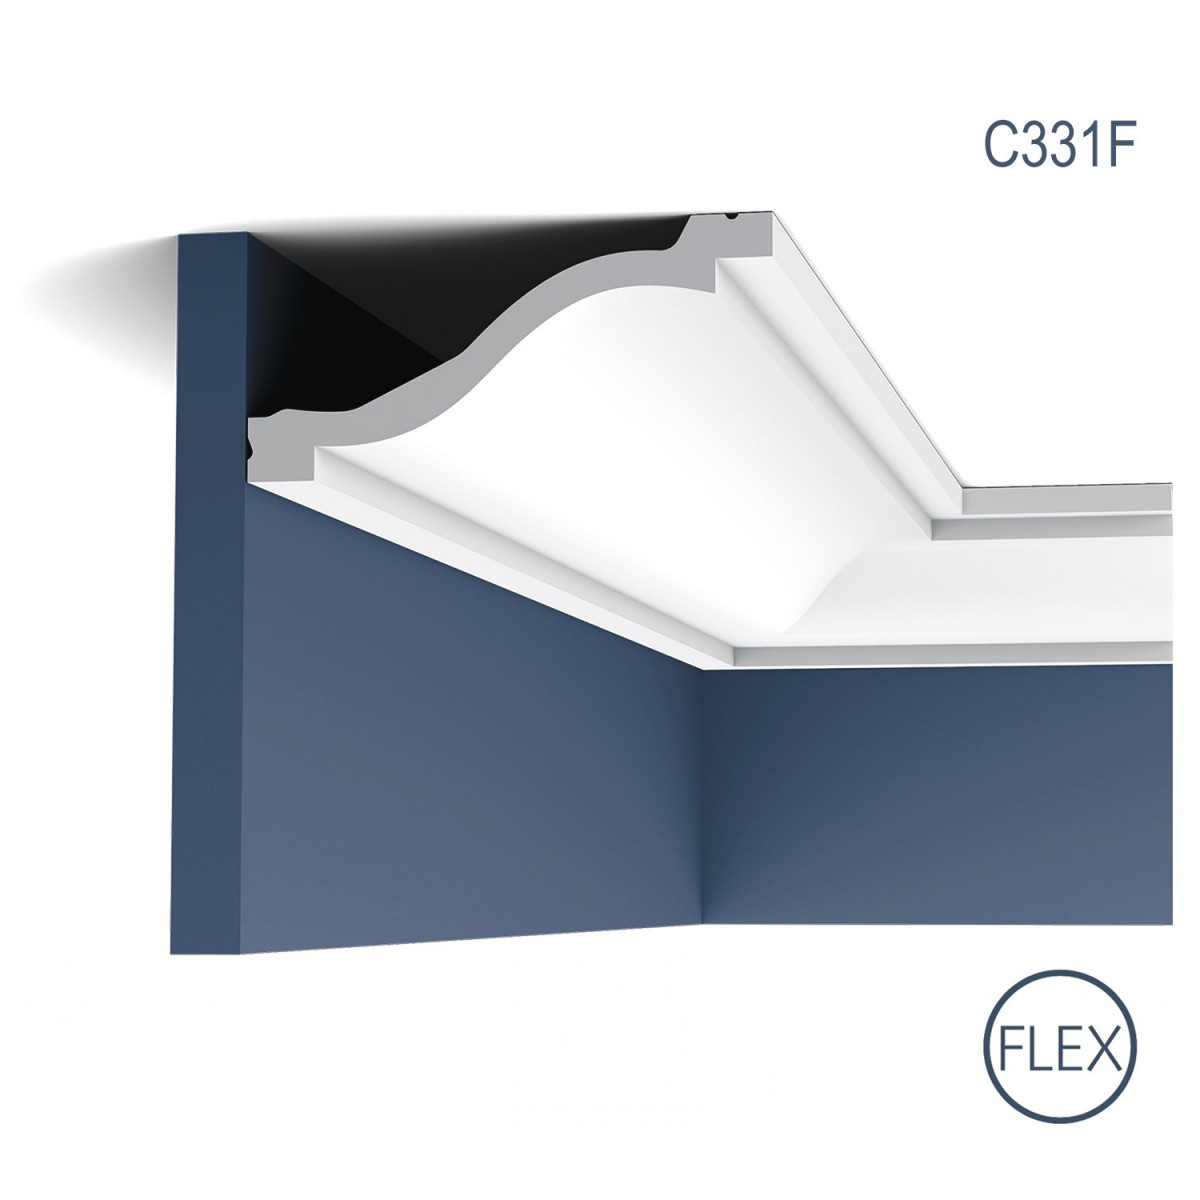 Cornisa Flex Luxxus C331F, Dimensiuni: 200 X 6.4 X 13.5 cm, Orac Decor